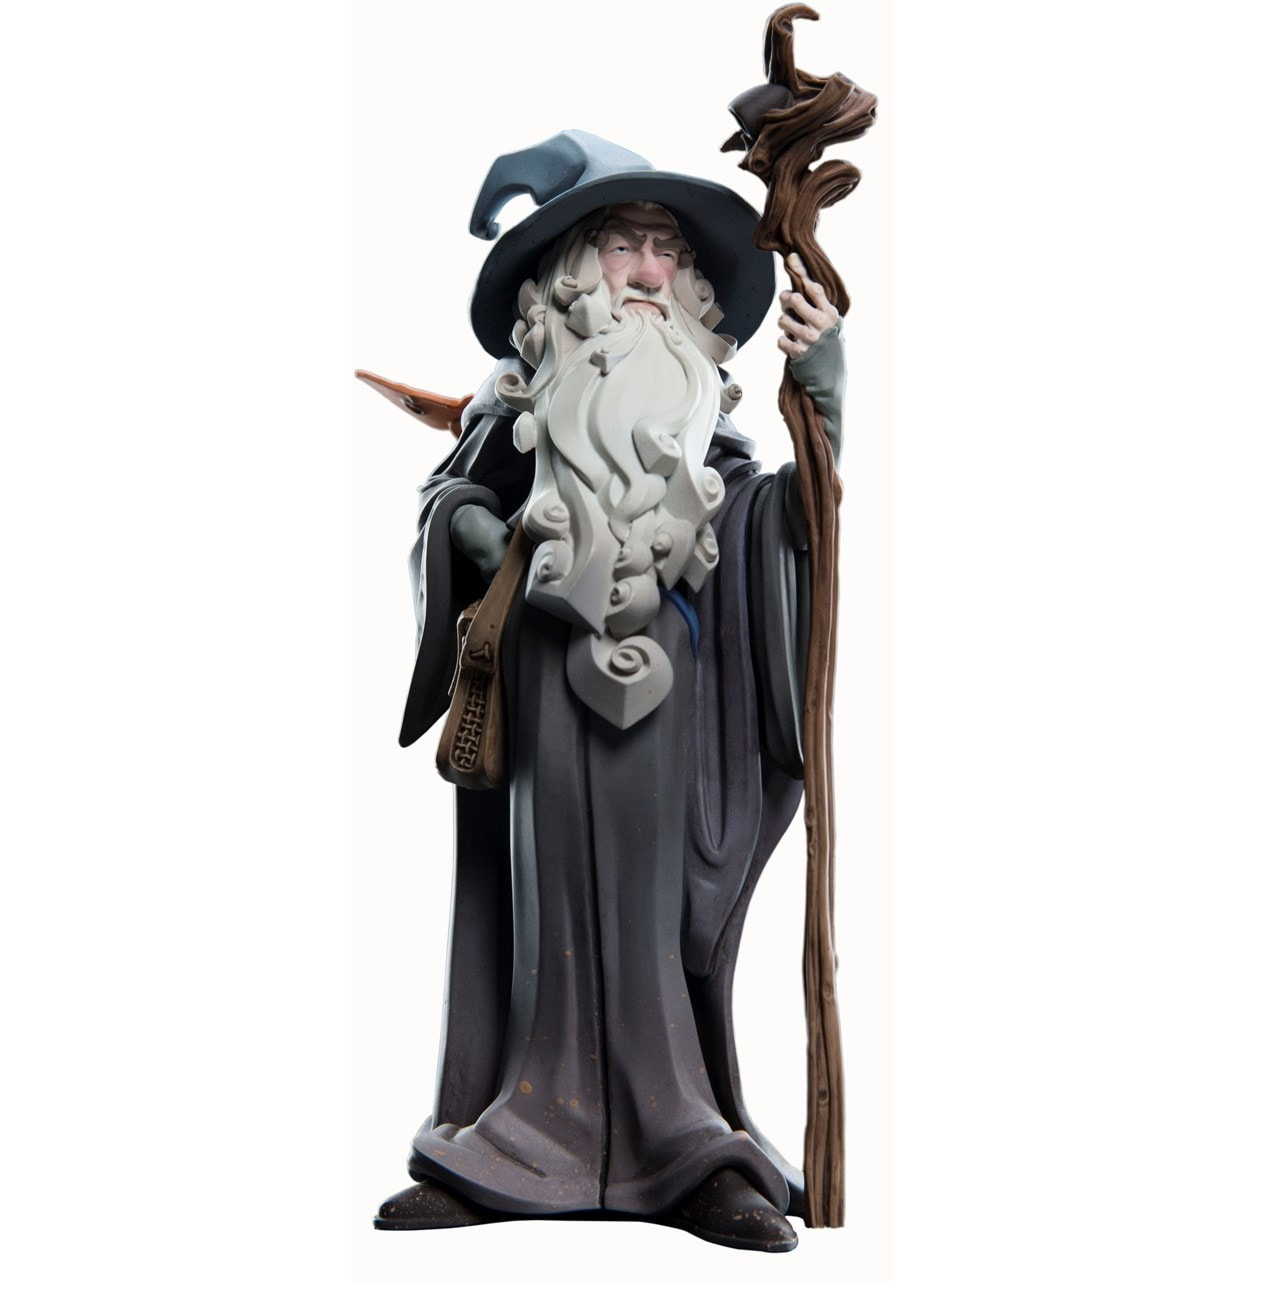 Gandalf The Grey: Lord Of The Rings: Weta Workshop Figurine - 1